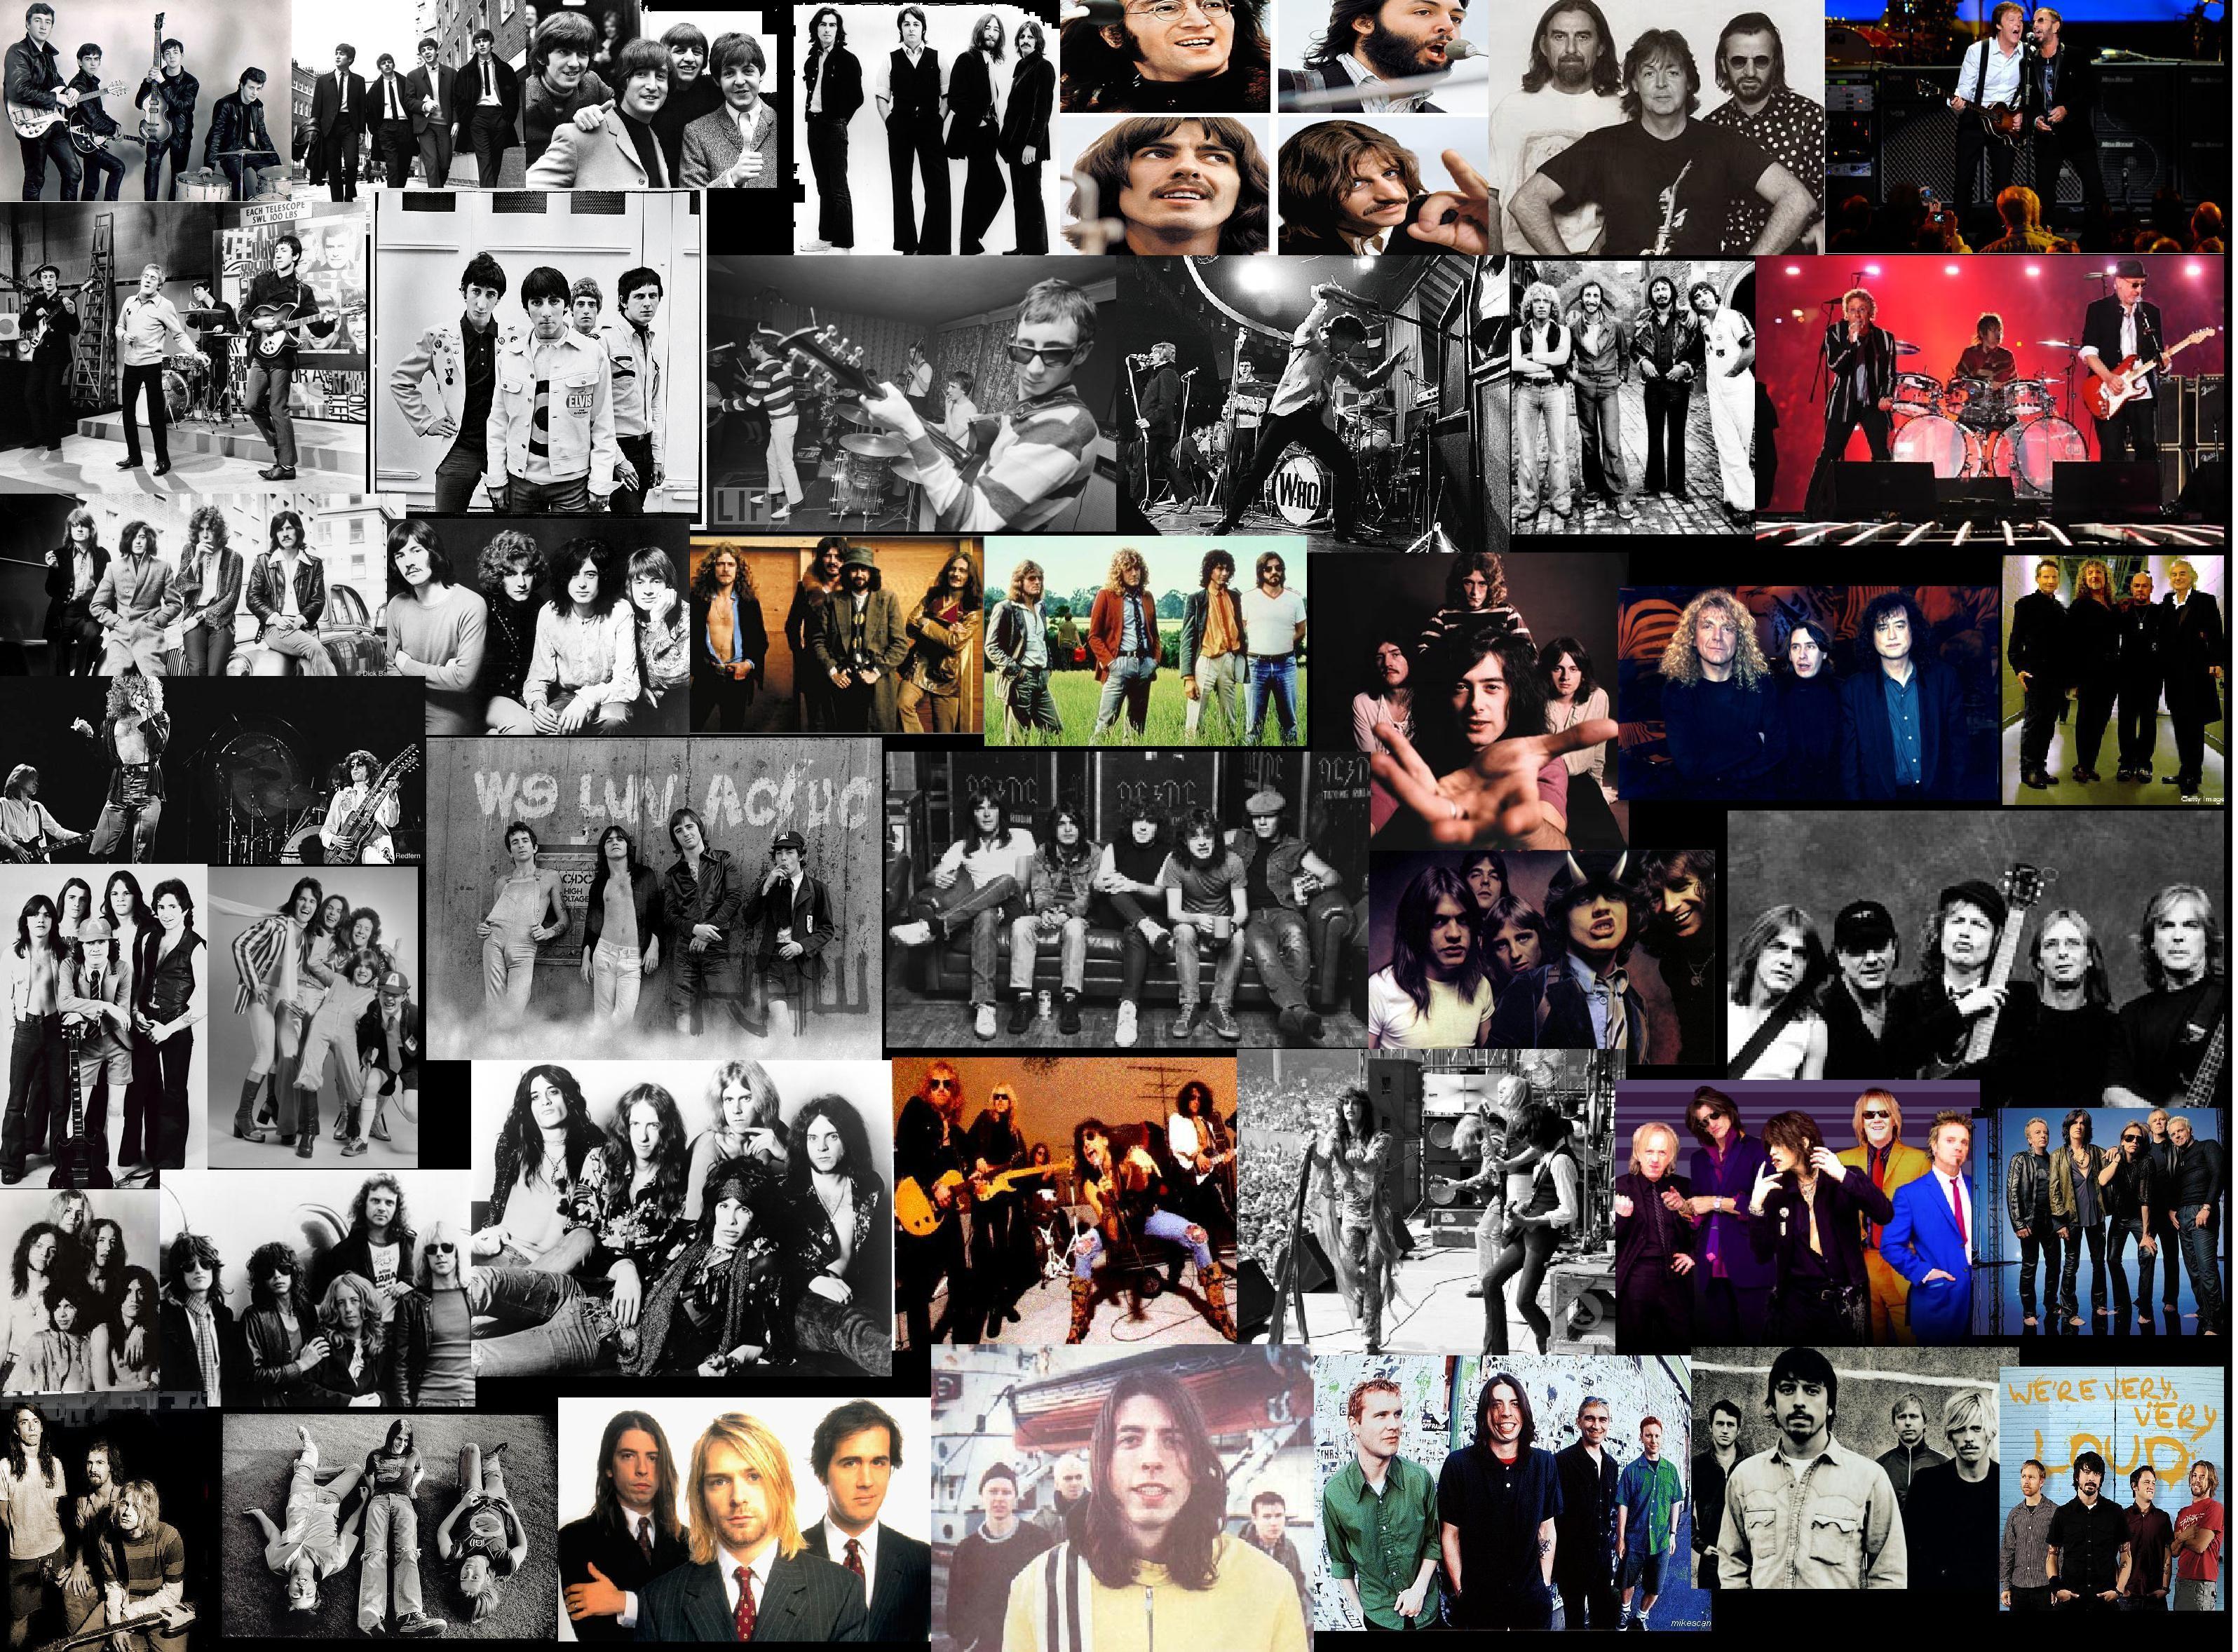 The Beatles Iphone 5 Wallpaper Crossover Full Hd Fondo De Pantalla And Fondo De